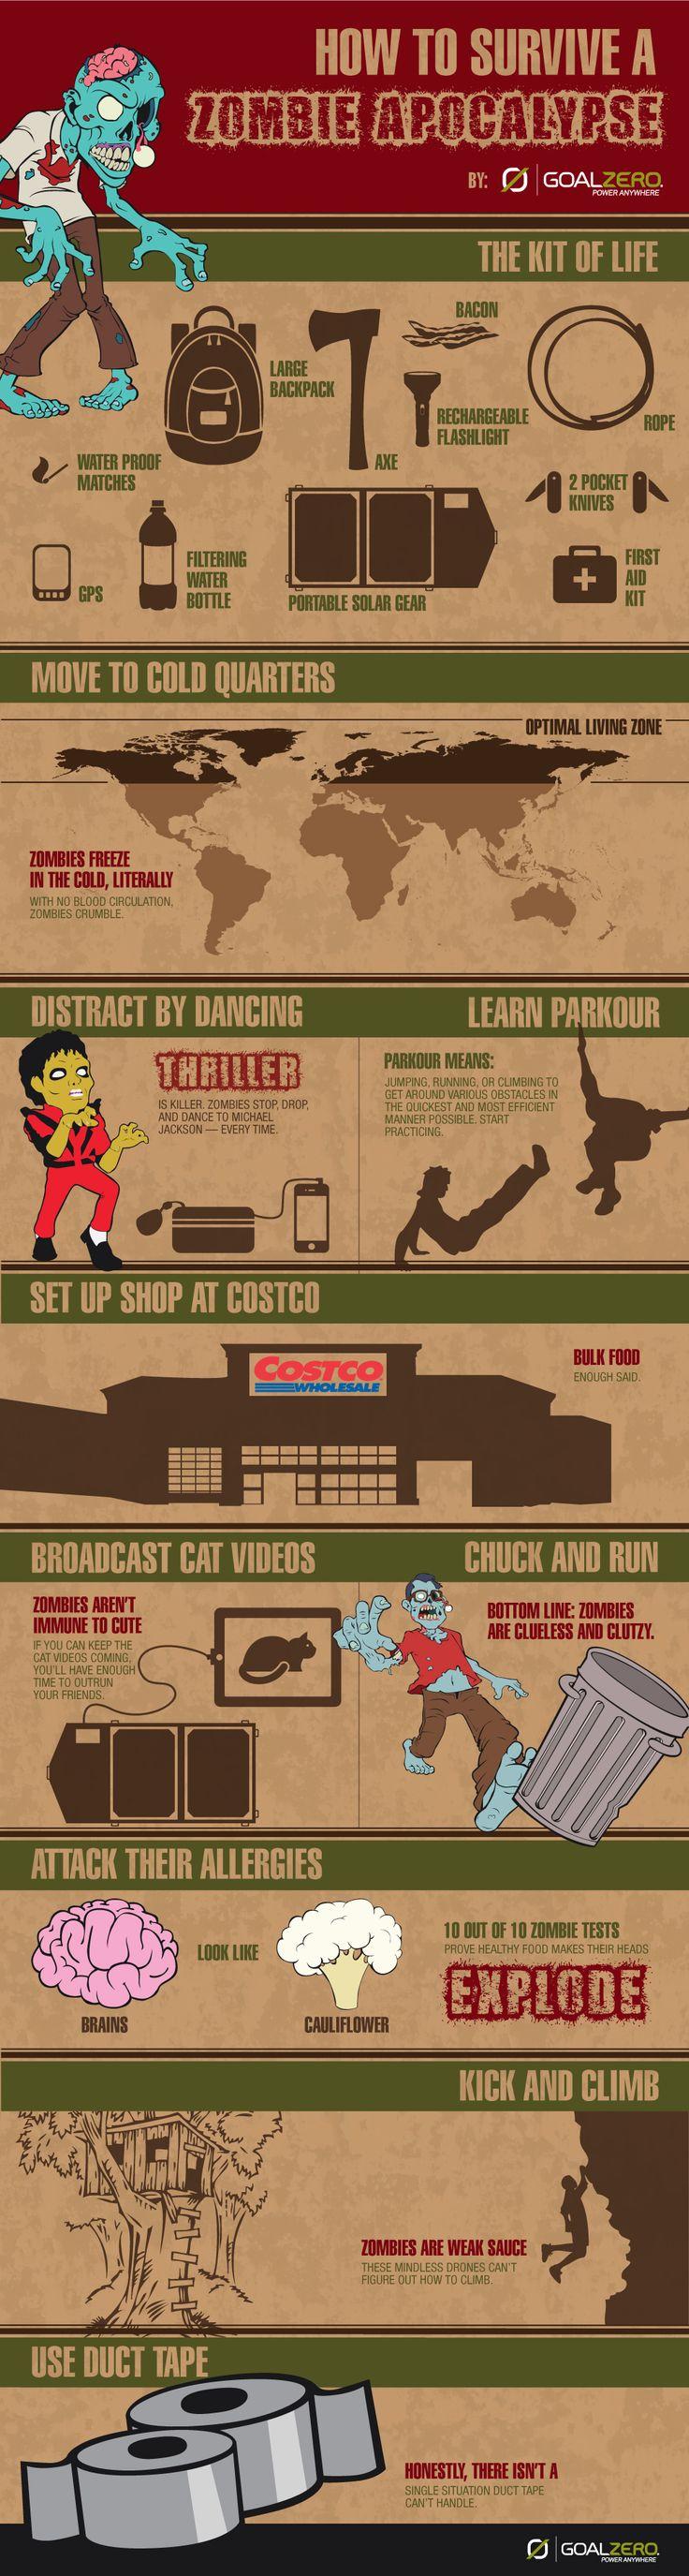 Tips to Survive the Zombie Apocalypse